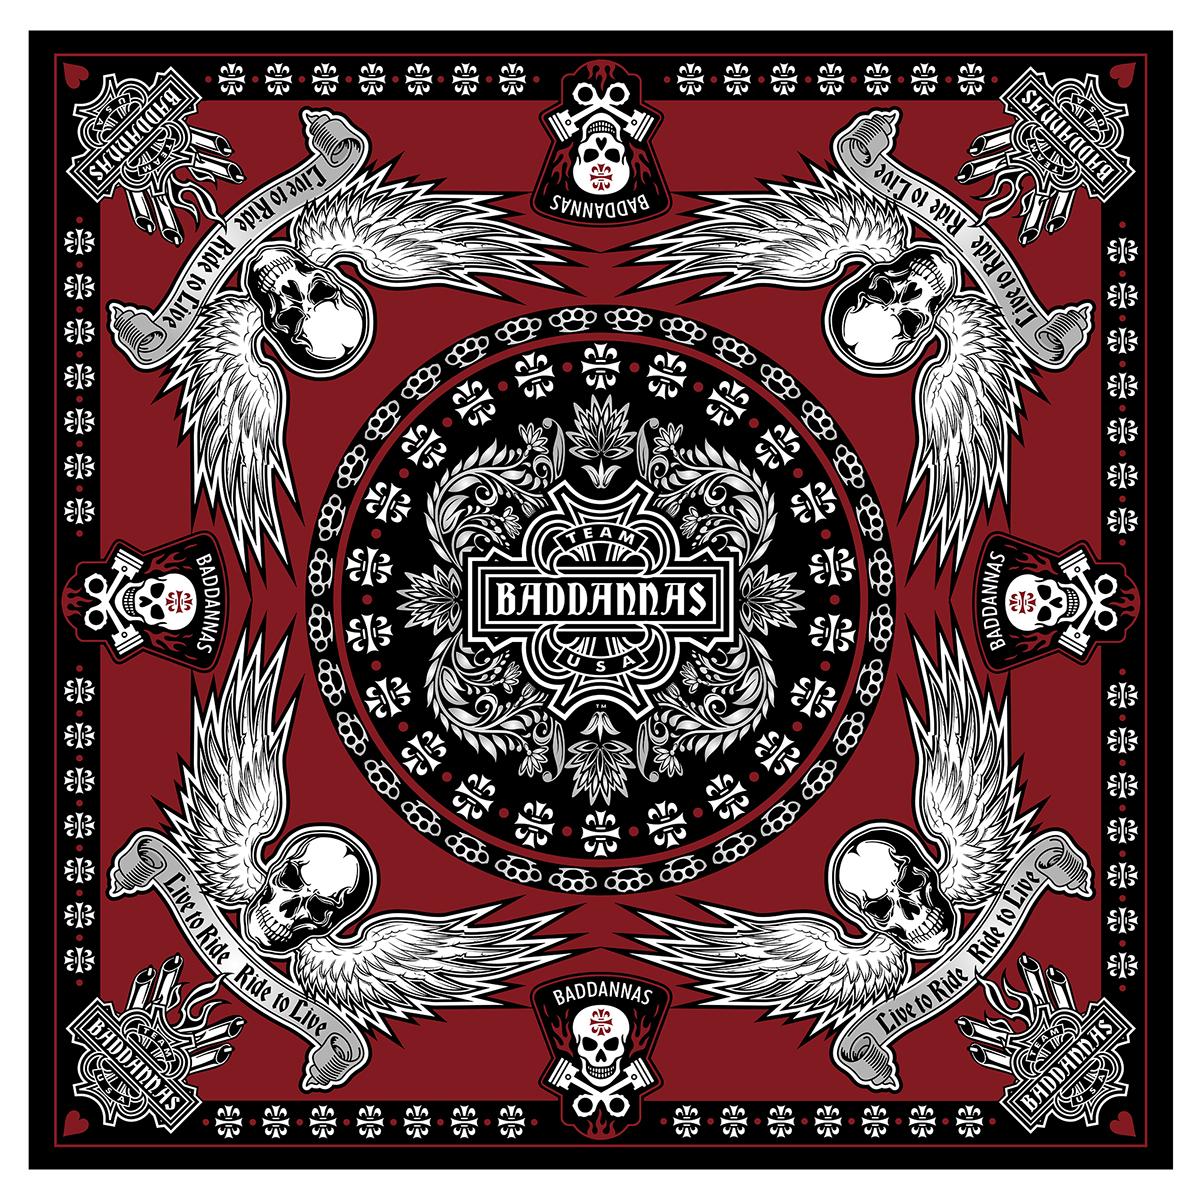 Handkerchiefs Biker Gear harley baddannas logos headwear clothing art scarfs bike art Harley Davidson